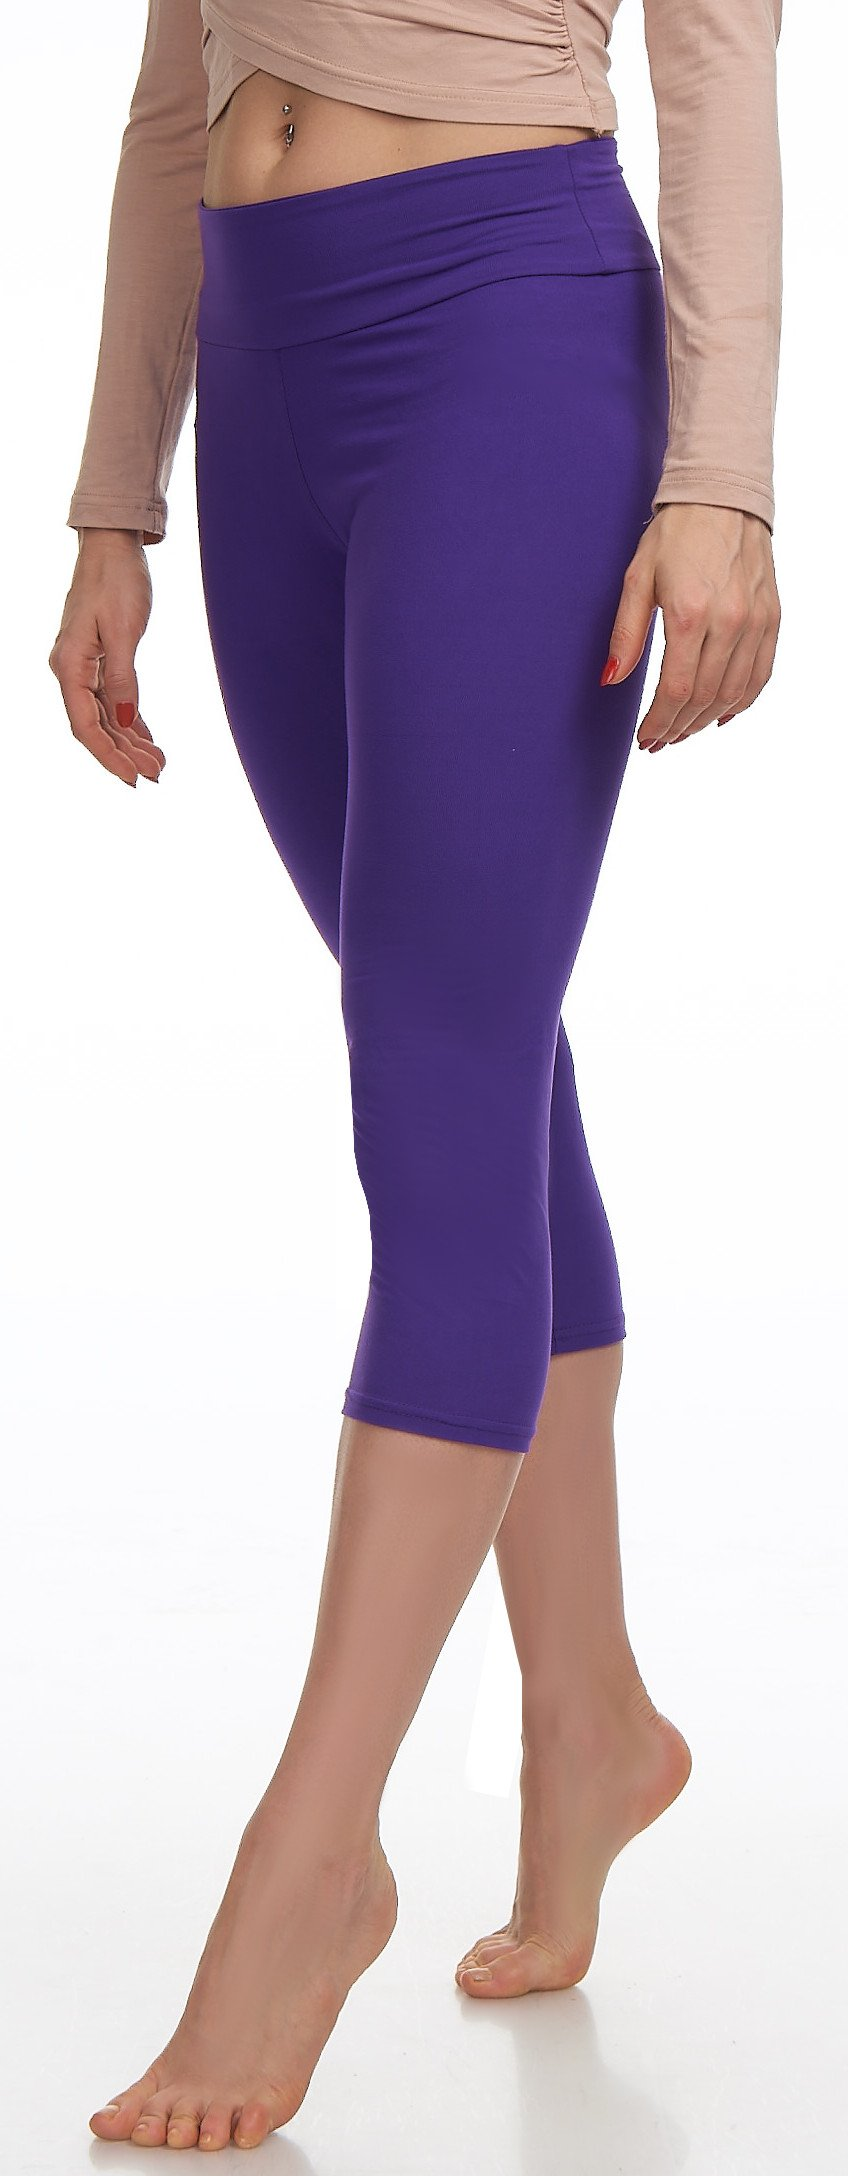 Lush Moda Extra Soft Leggings Variety of ColorsPlus Size Yoga Waist Purple, One Size fits Most (XL 3XL), Purple Yoga Waist by LMB (Image #9)